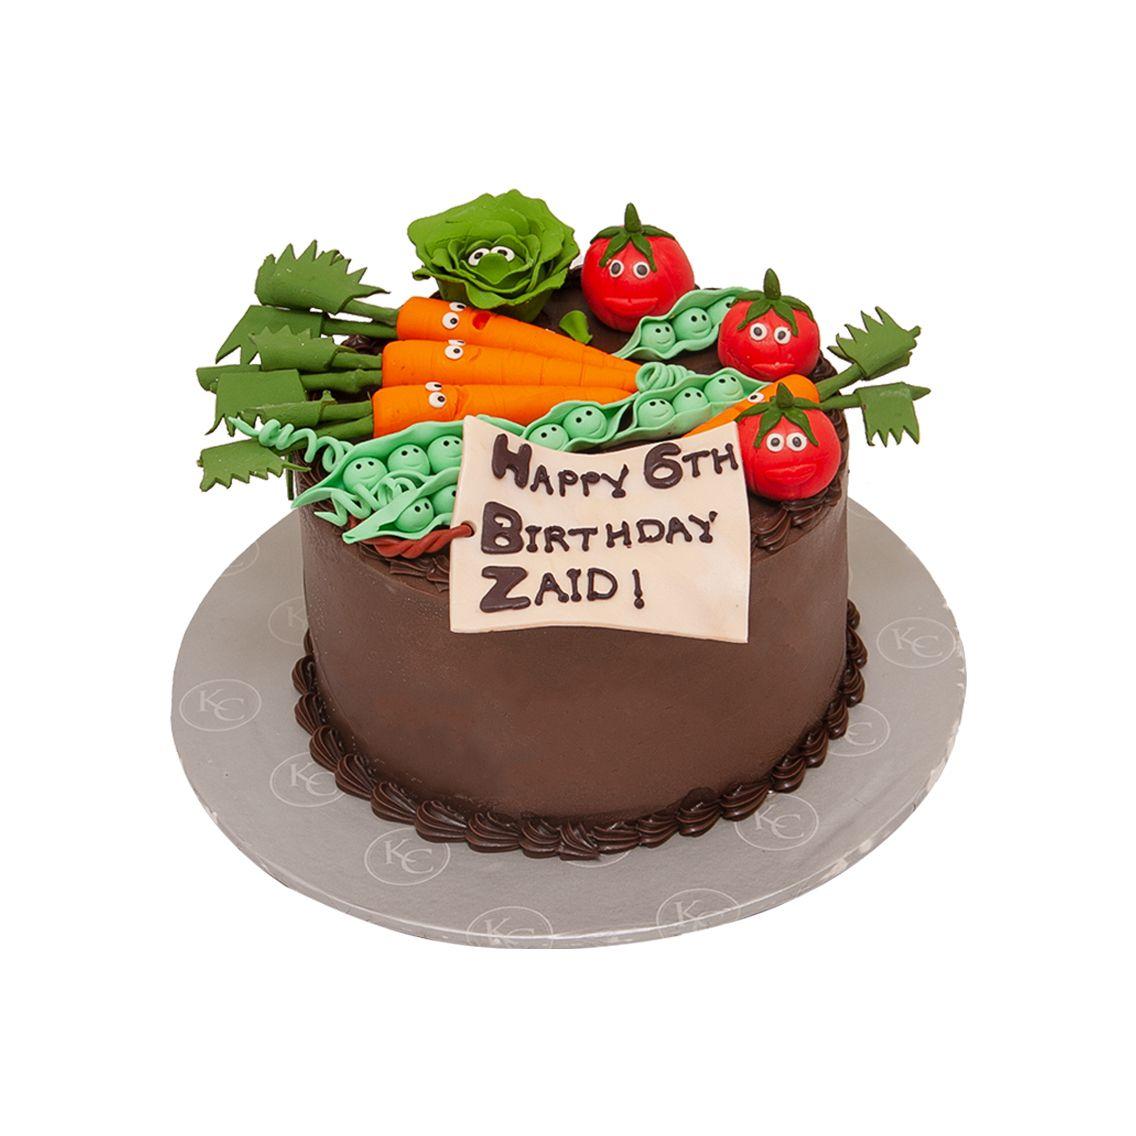 Kitchen Cuisine Default Category Vegetable Cake